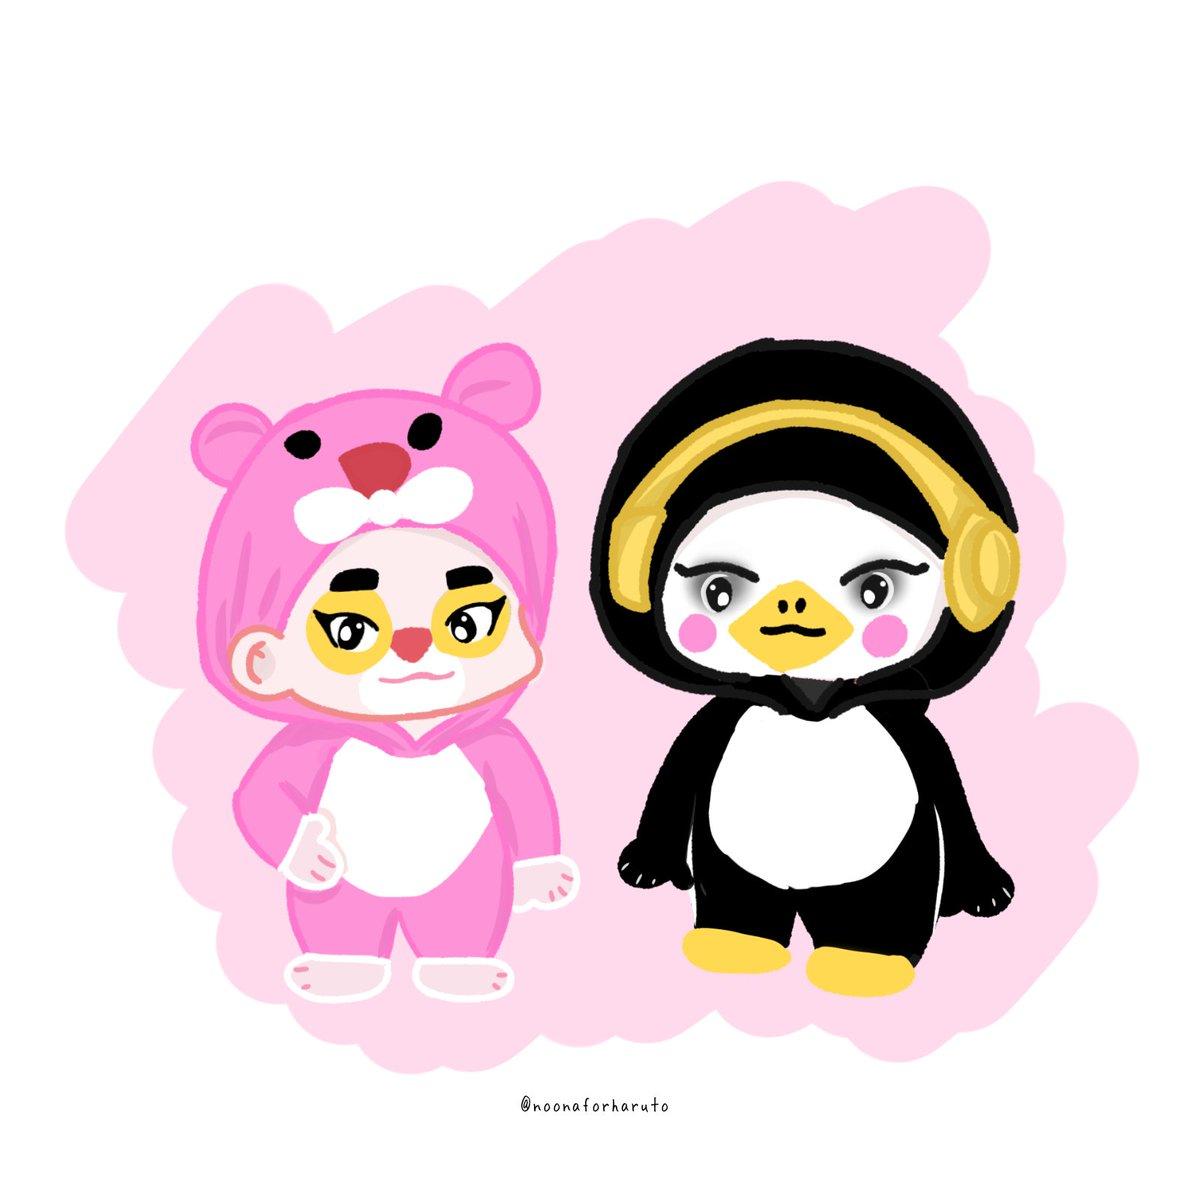 Pink panther & Penguin 🐧  #BANGYEDAM #yedam #방예담 #예담 #parkjeongwoo #박정우 #jeongwoo #정우 #TREASUREfanart